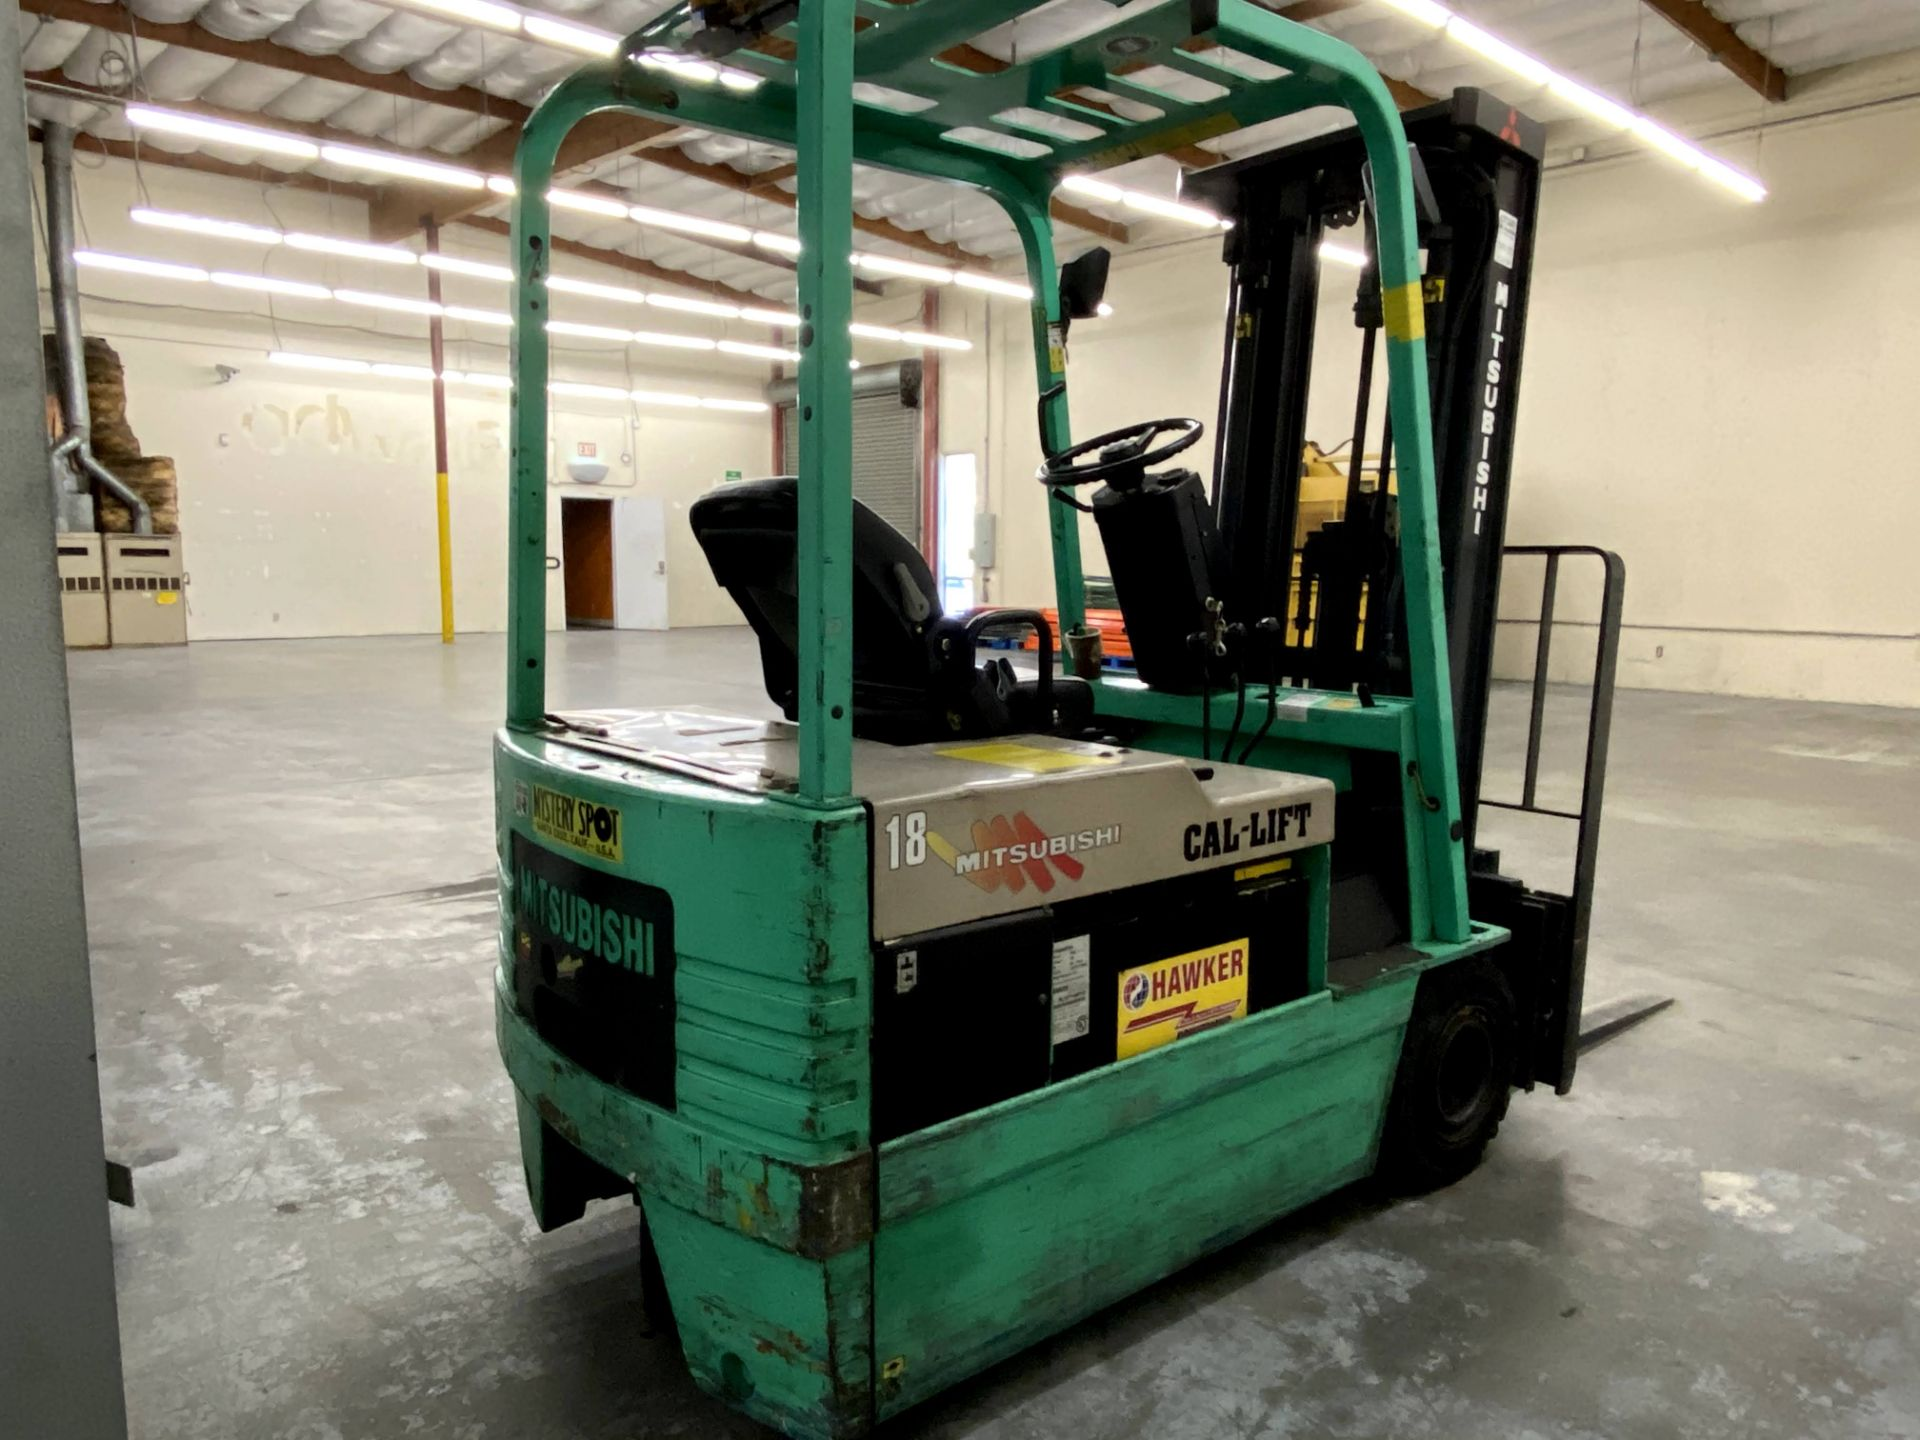 Mitsubishi Electric Forklift - Image 3 of 10